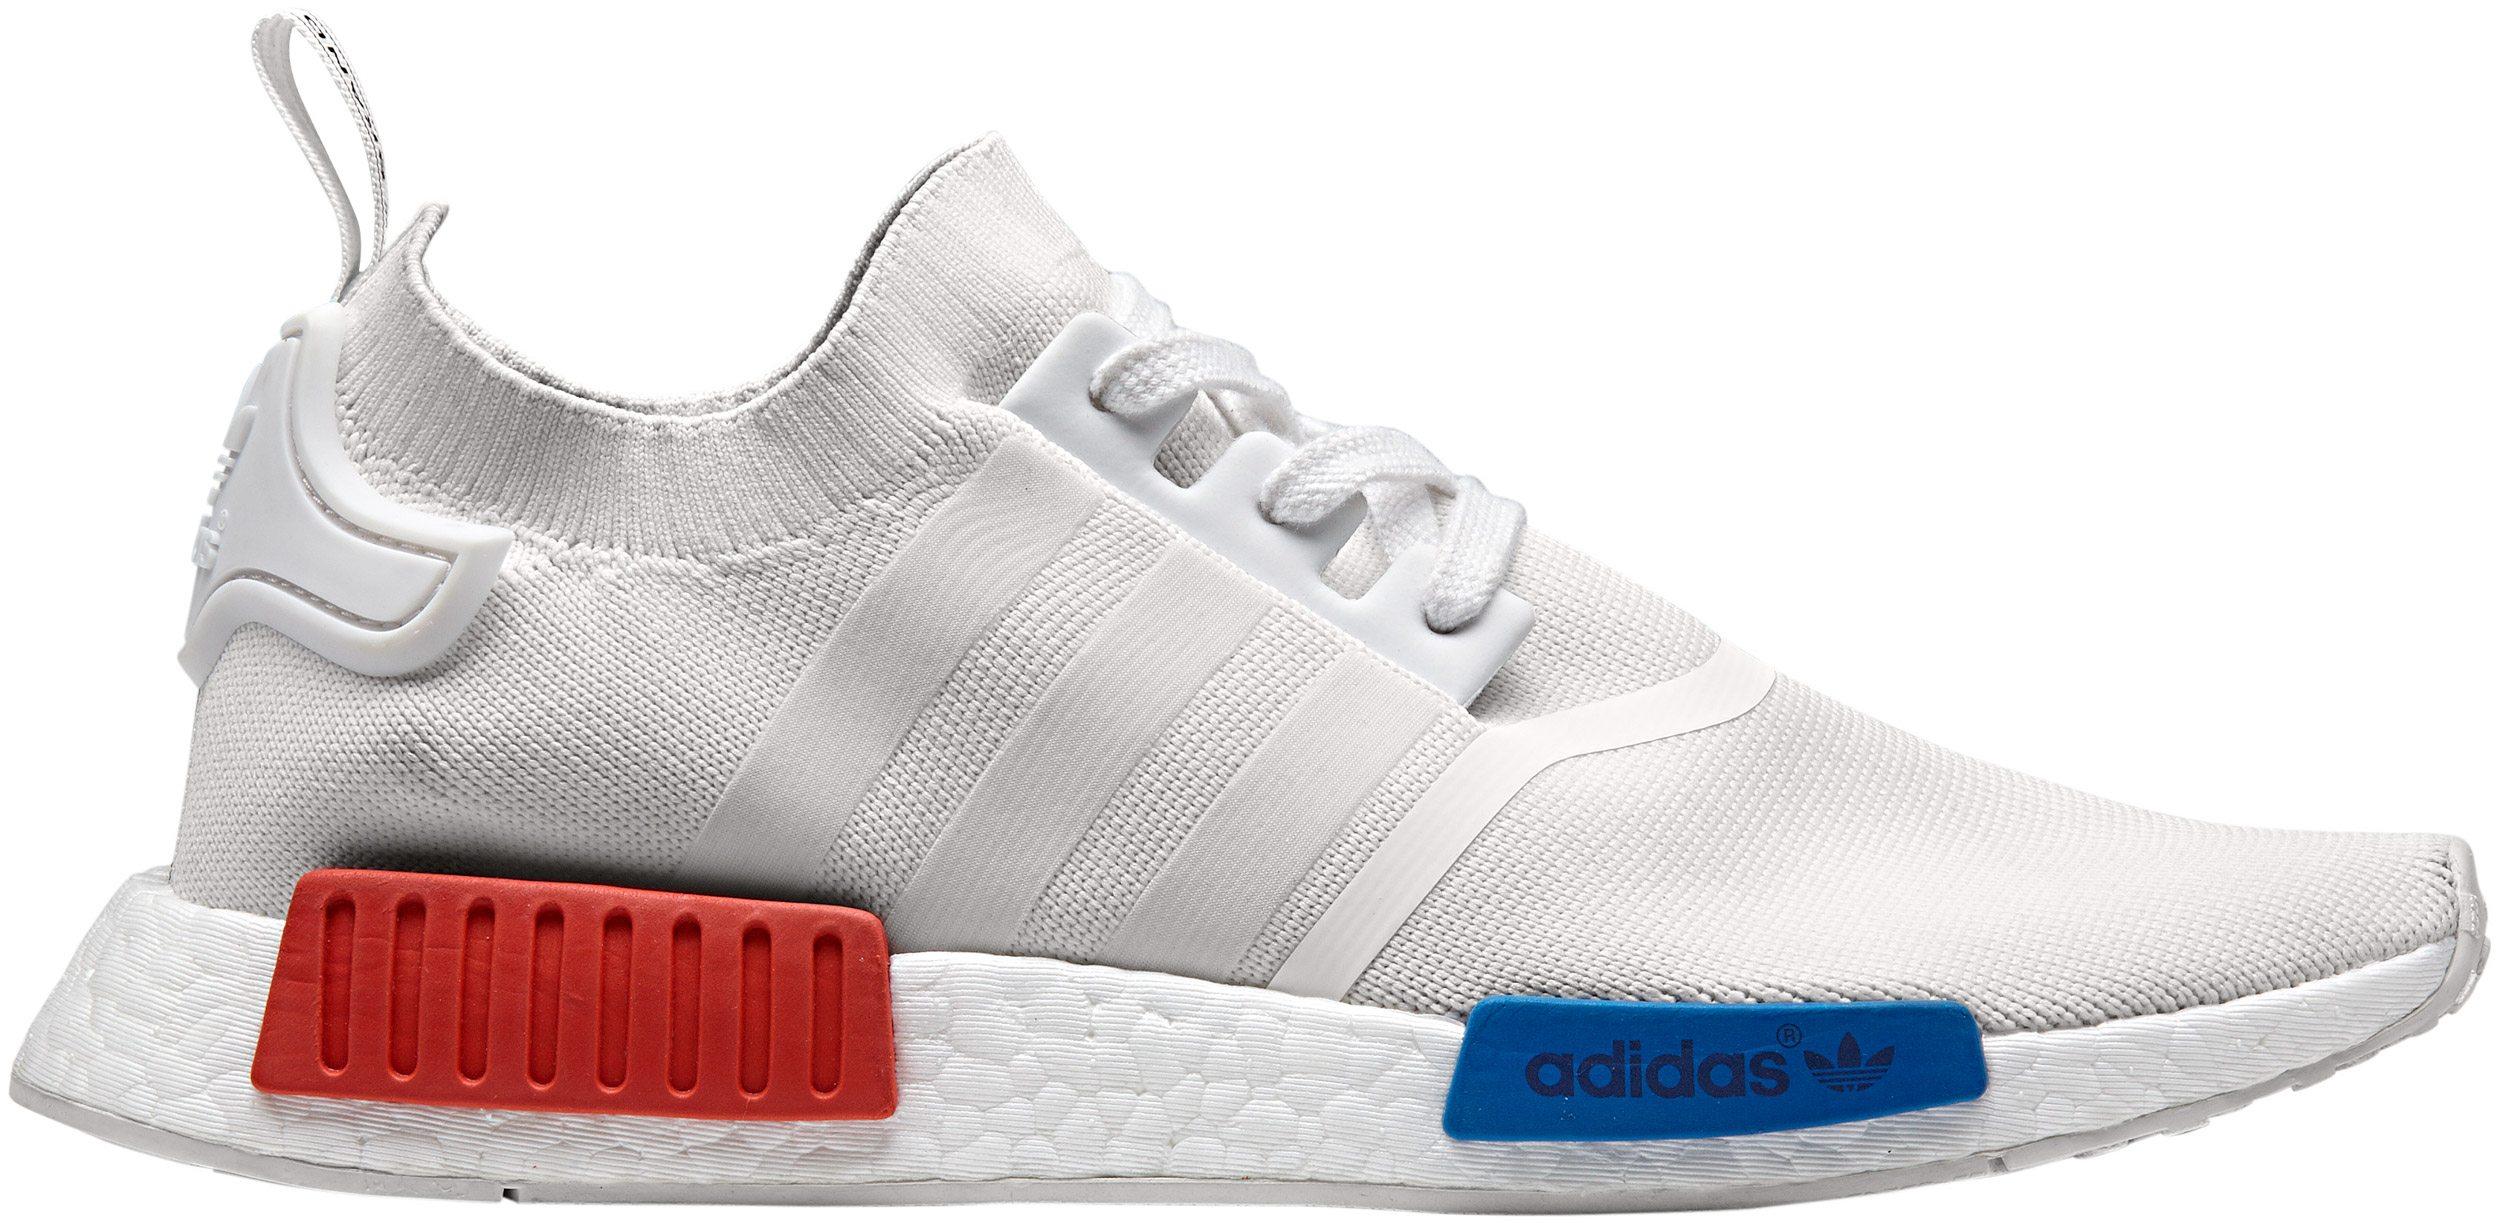 adidas NMD Primeknit White OG 10